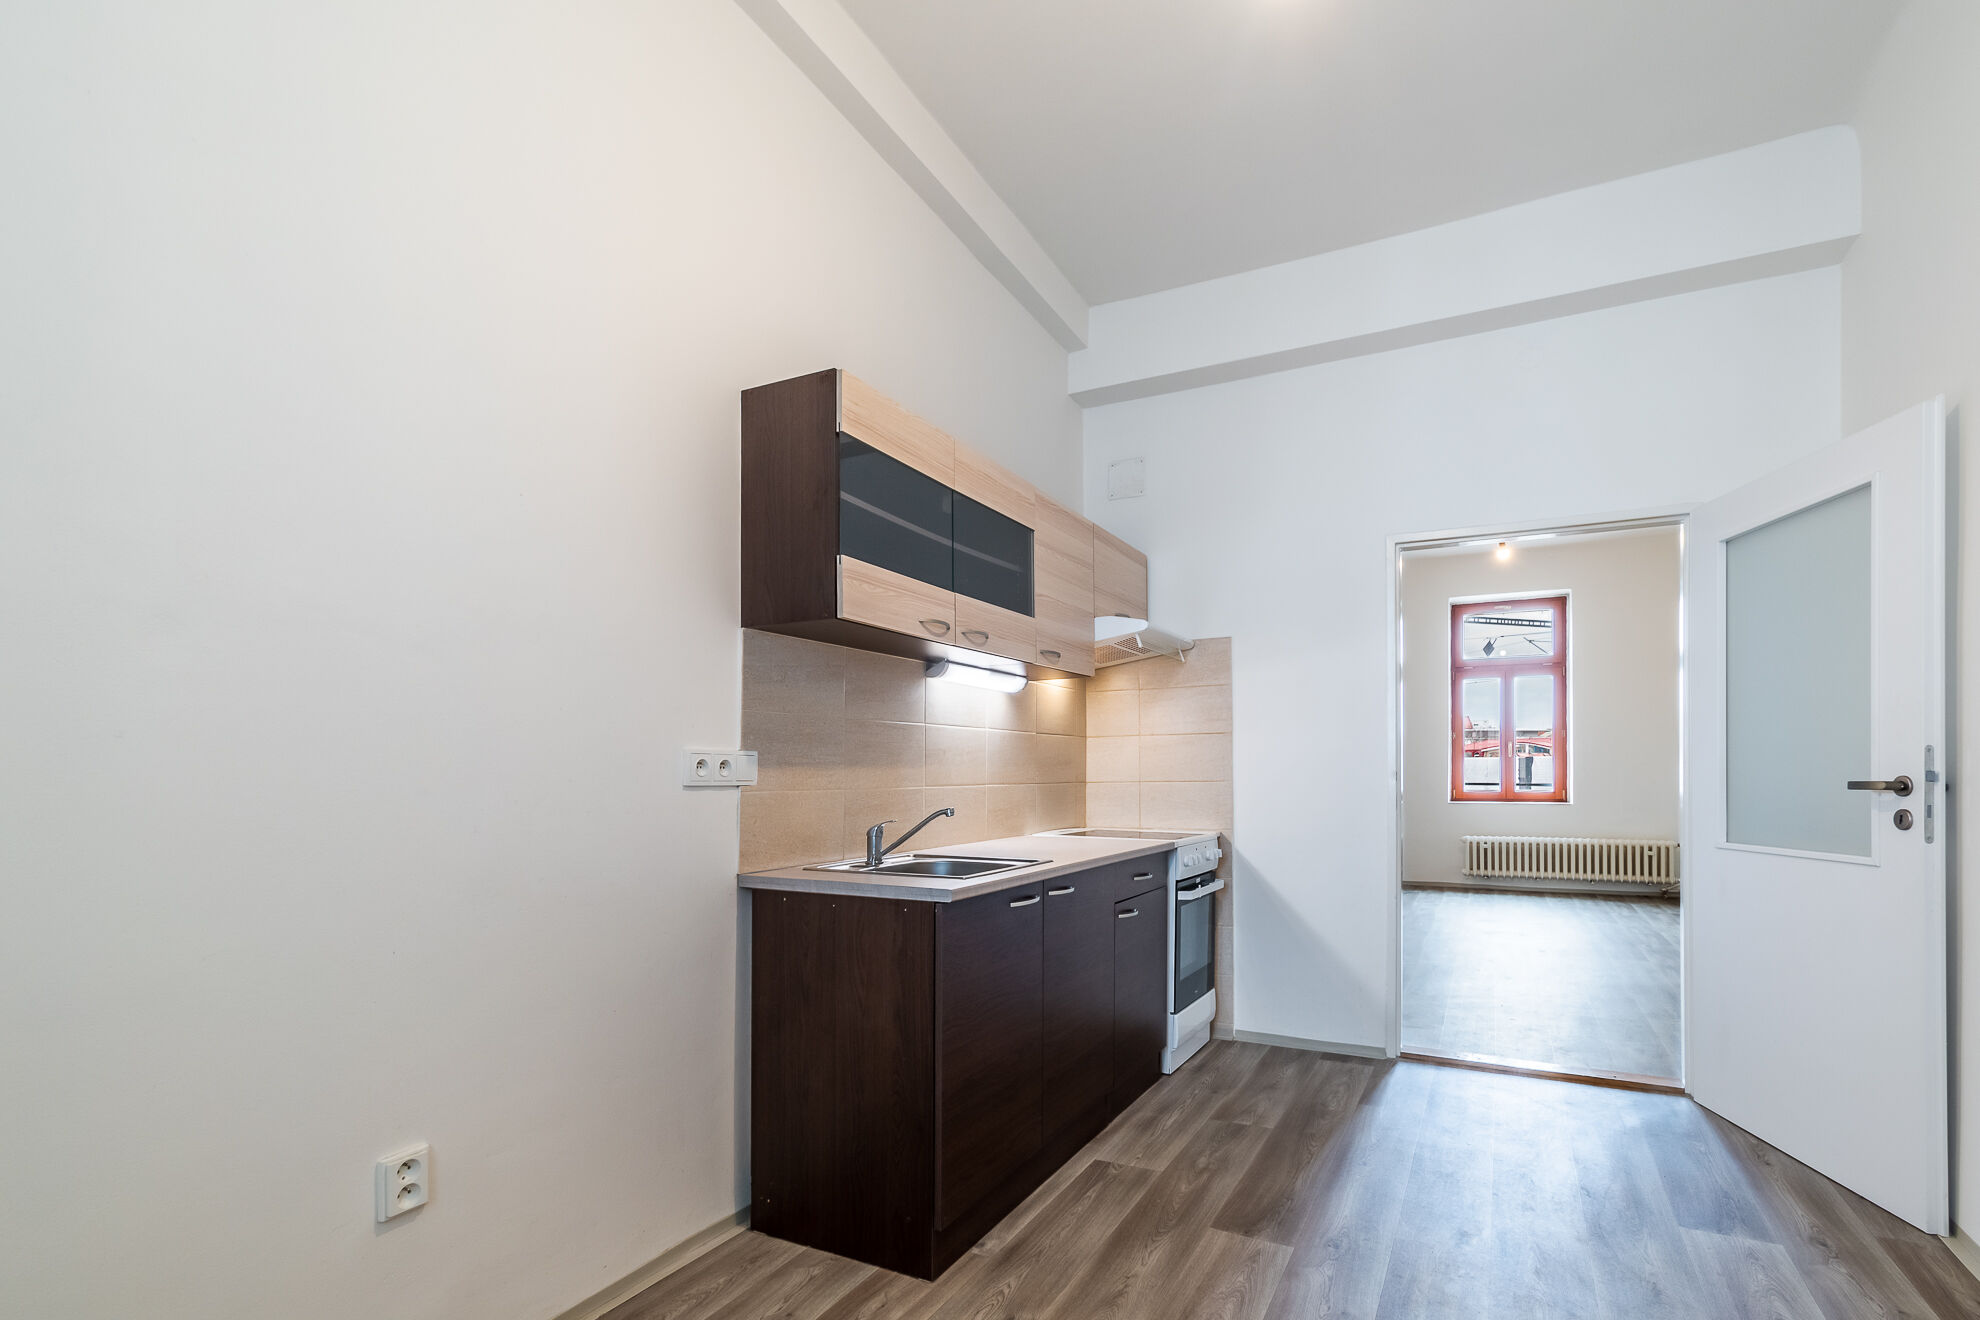 Pronájem bytu 2+1 - 56 m², Praha - Radotín